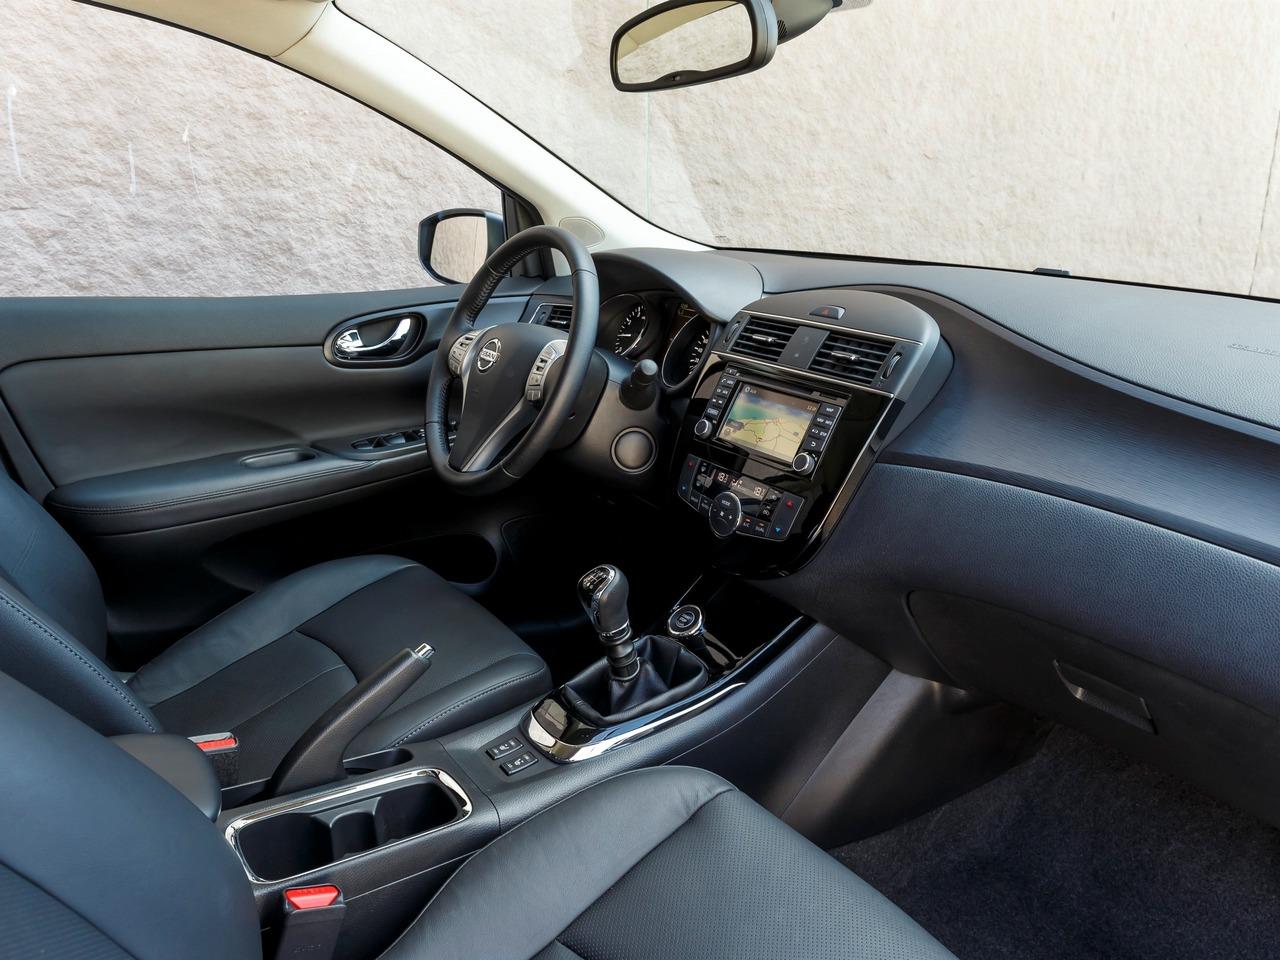 Снимки: Nissan Pulsar VI